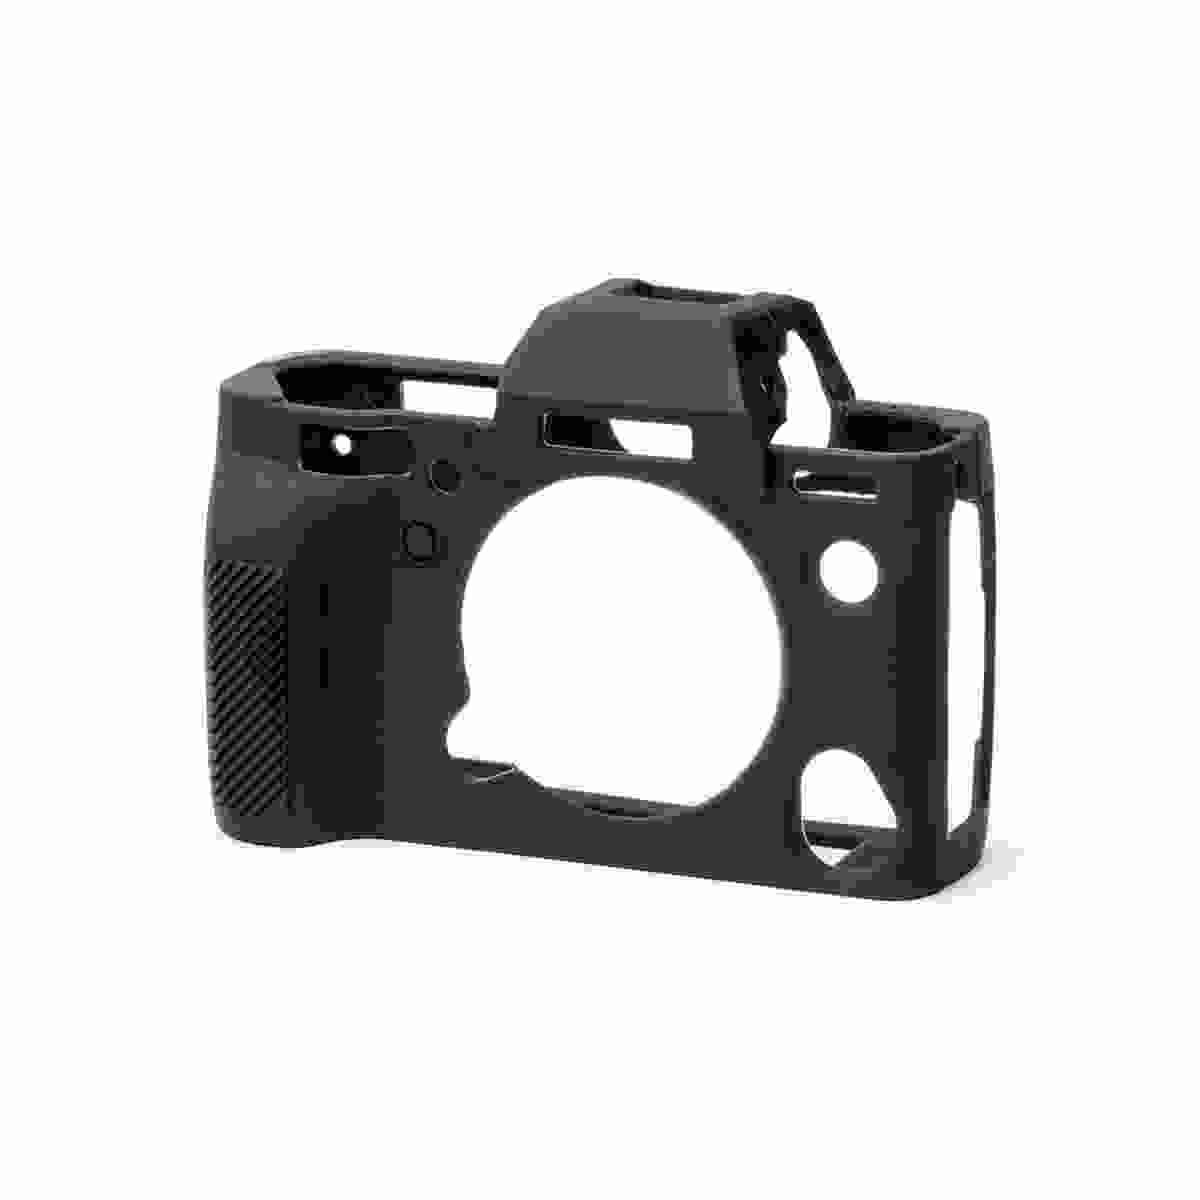 Walimex pro easyCover for Fujifilm X-T3